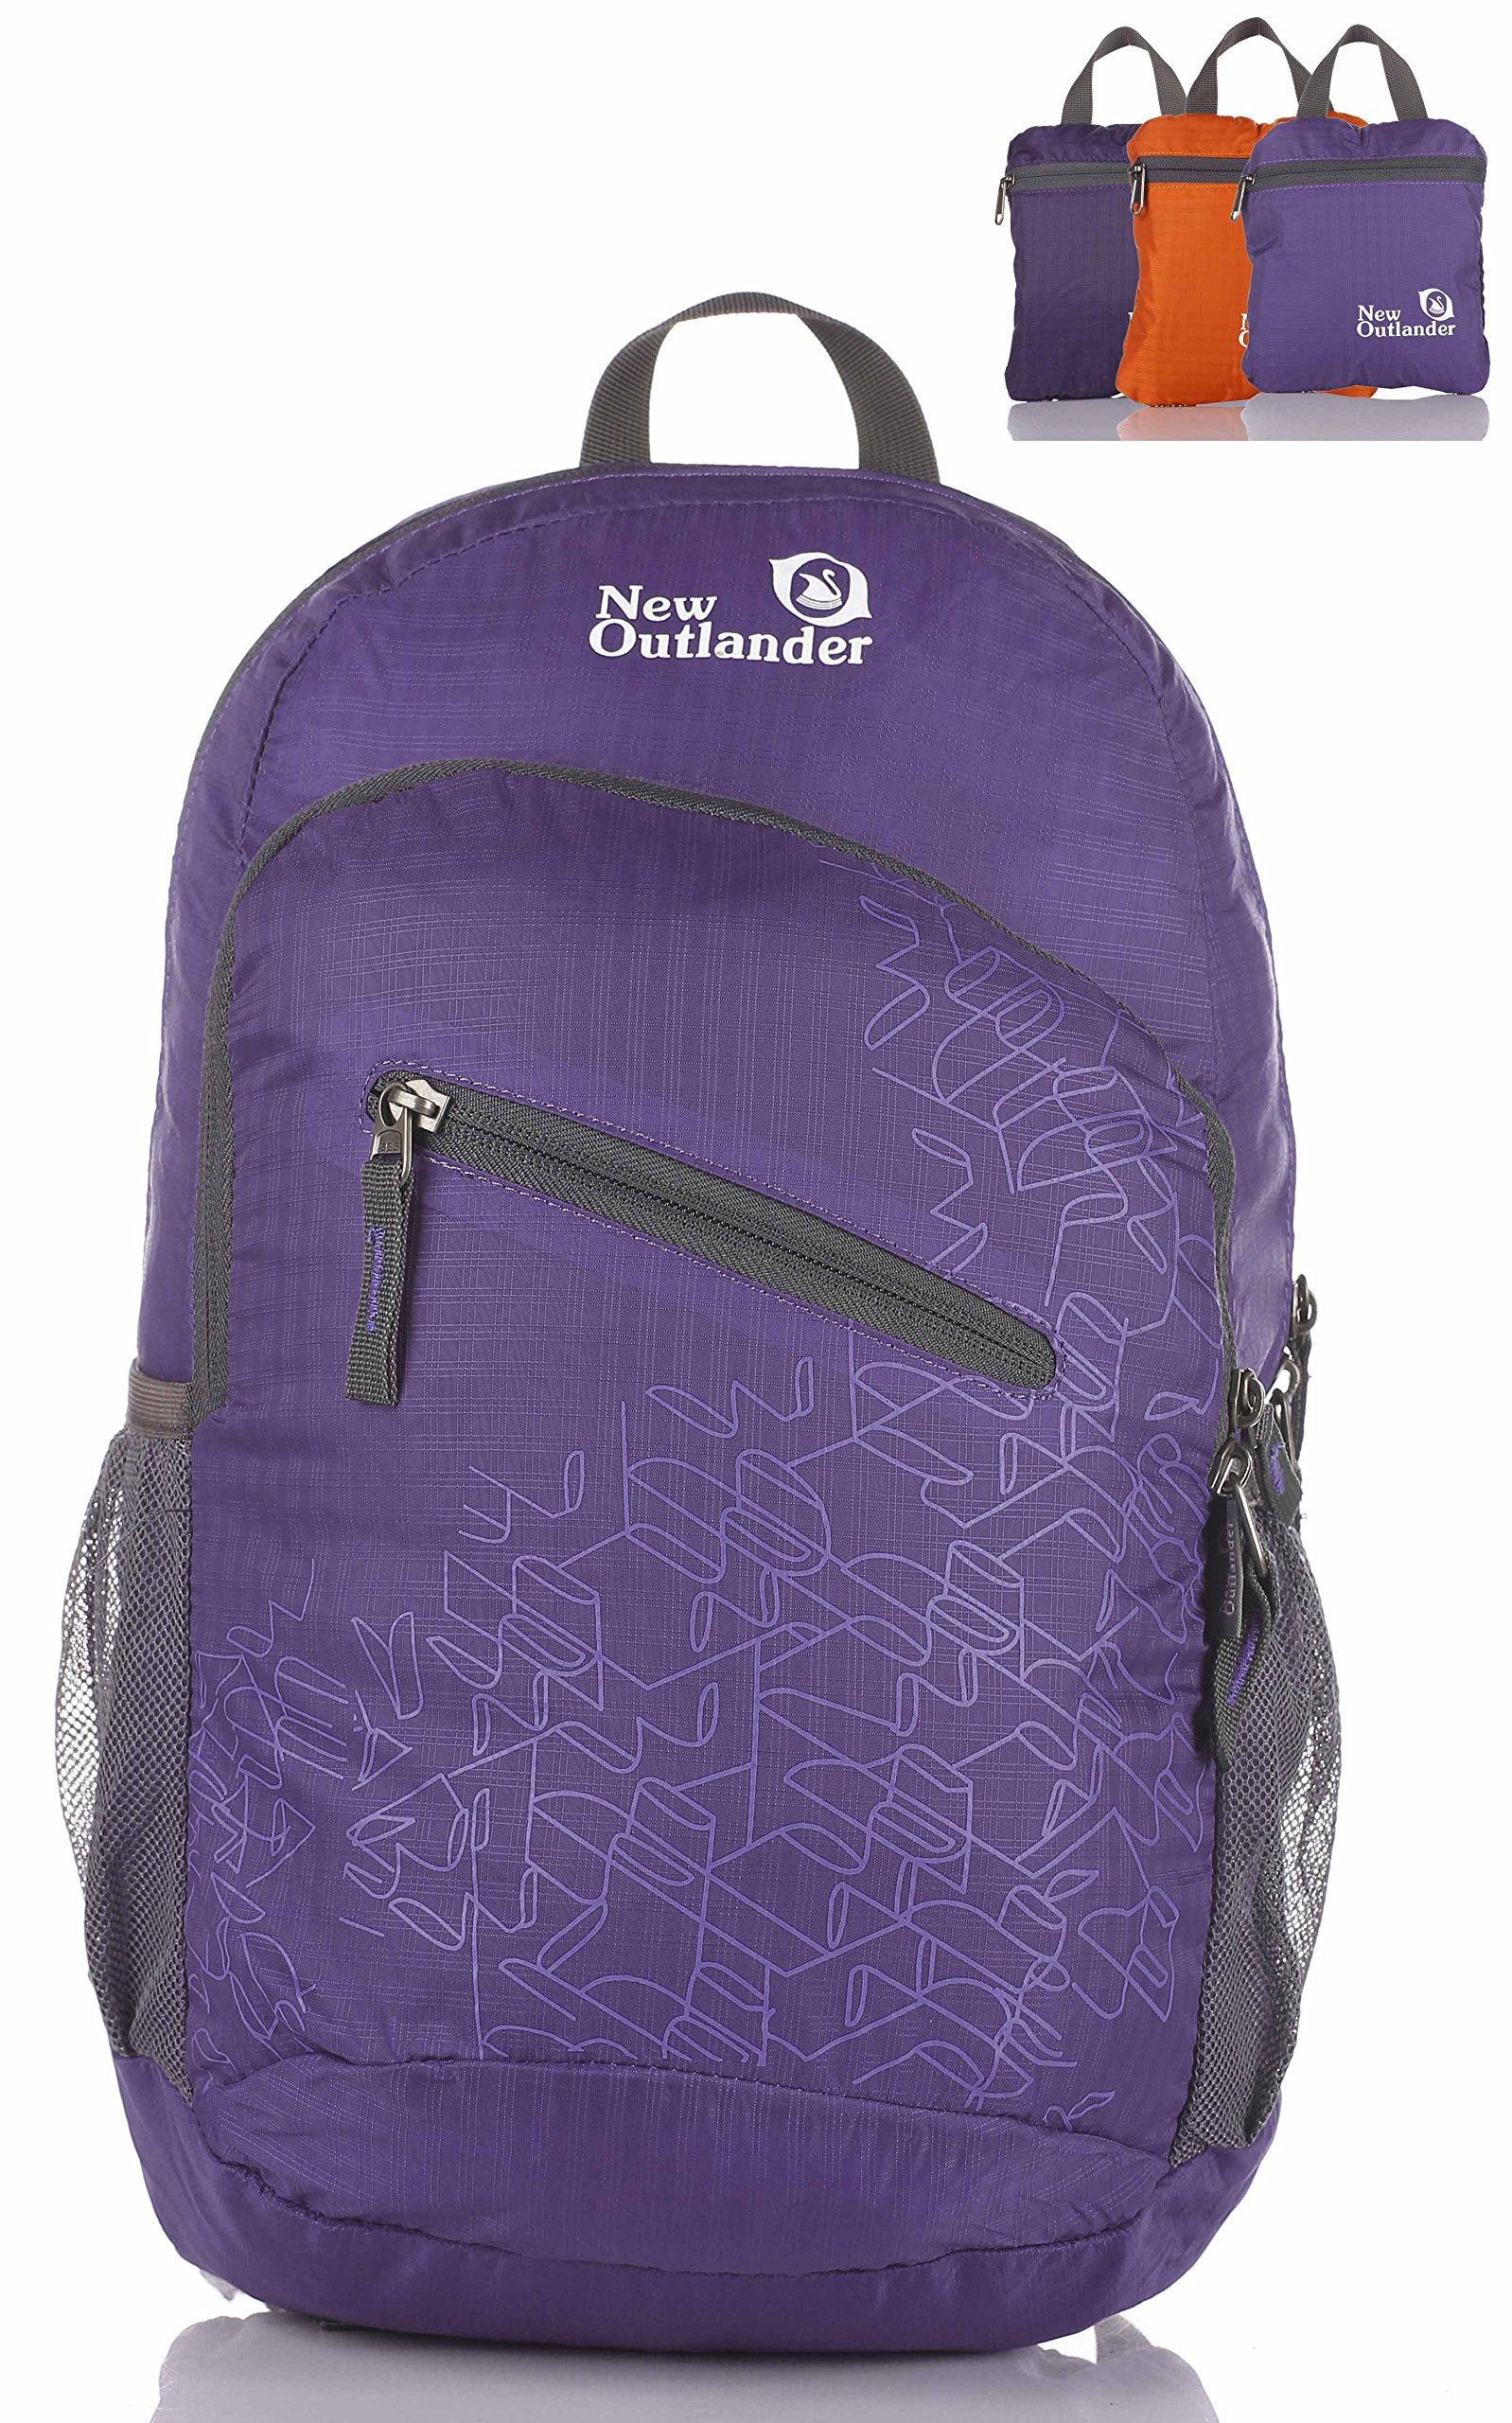 Outlander Packable Handy Lightweight Travel Hiking Backpack Daypack-Purple-L